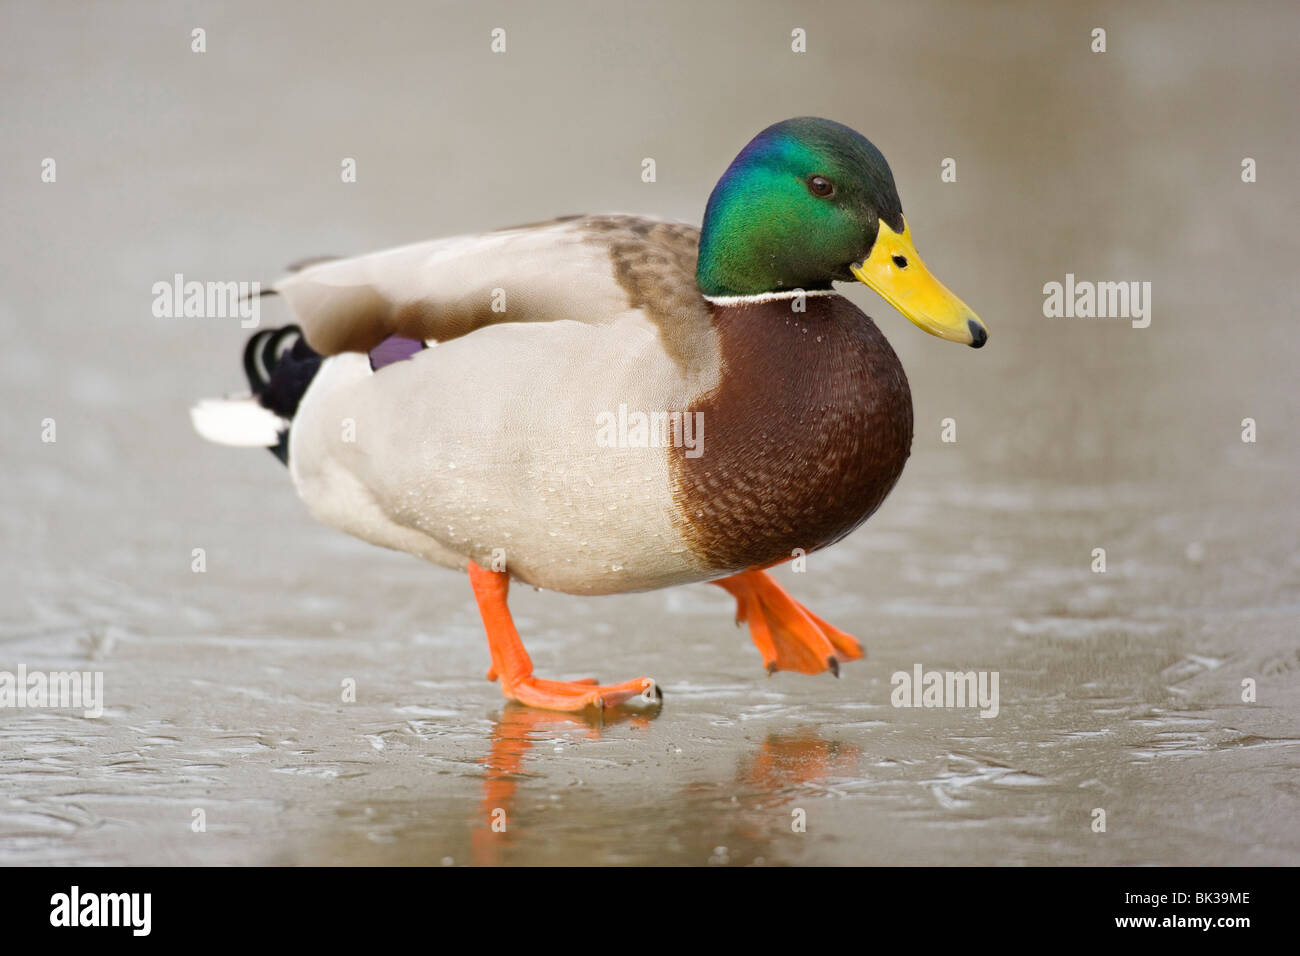 Male mallard in winter standing on ice - Stock Image